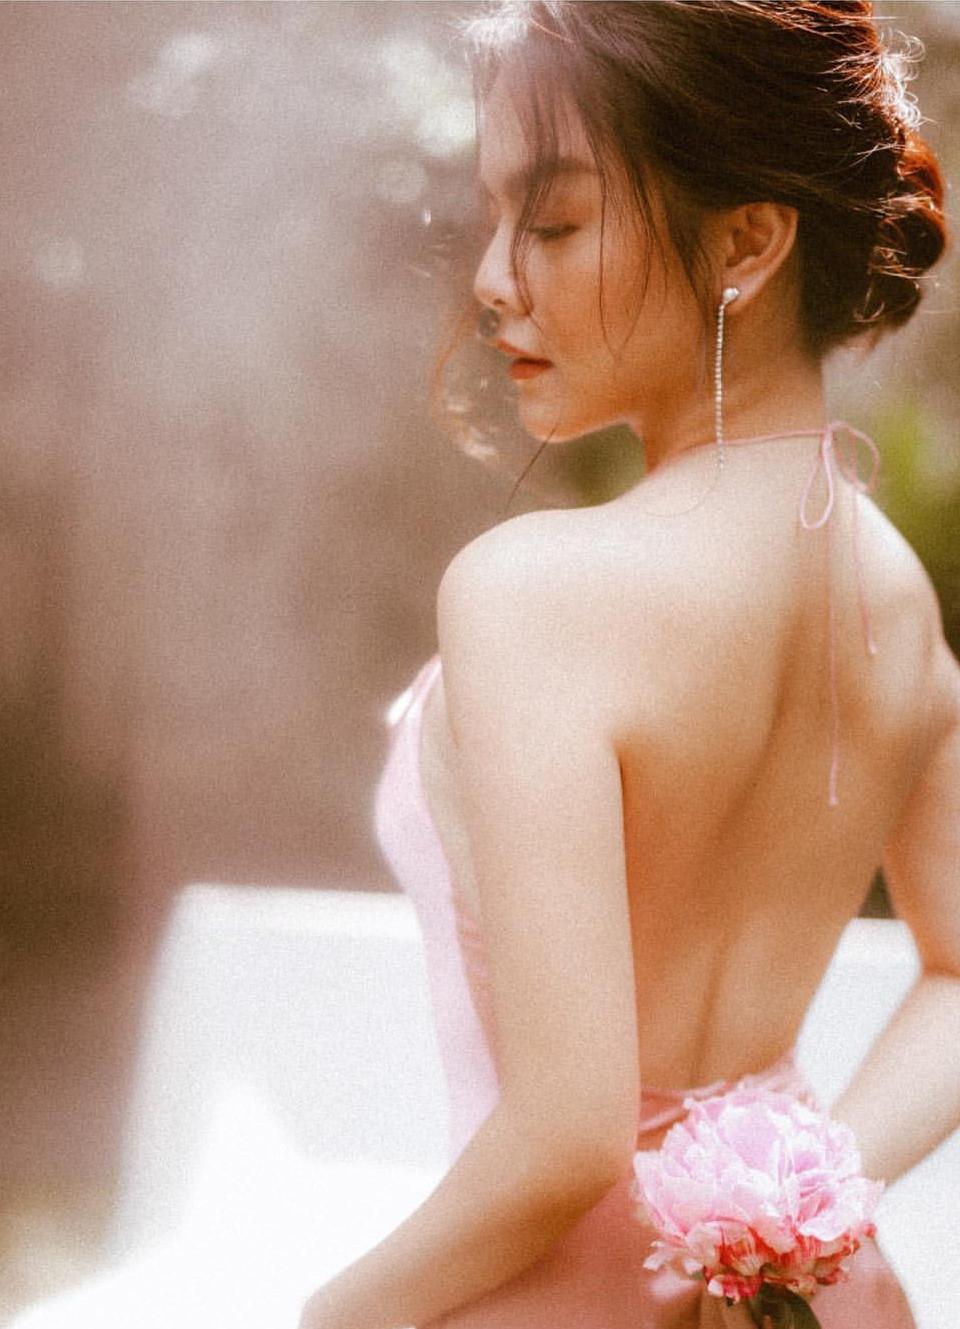 Pham Quynh Anh lan hiem hoi dang anh mac bikini hinh anh 9